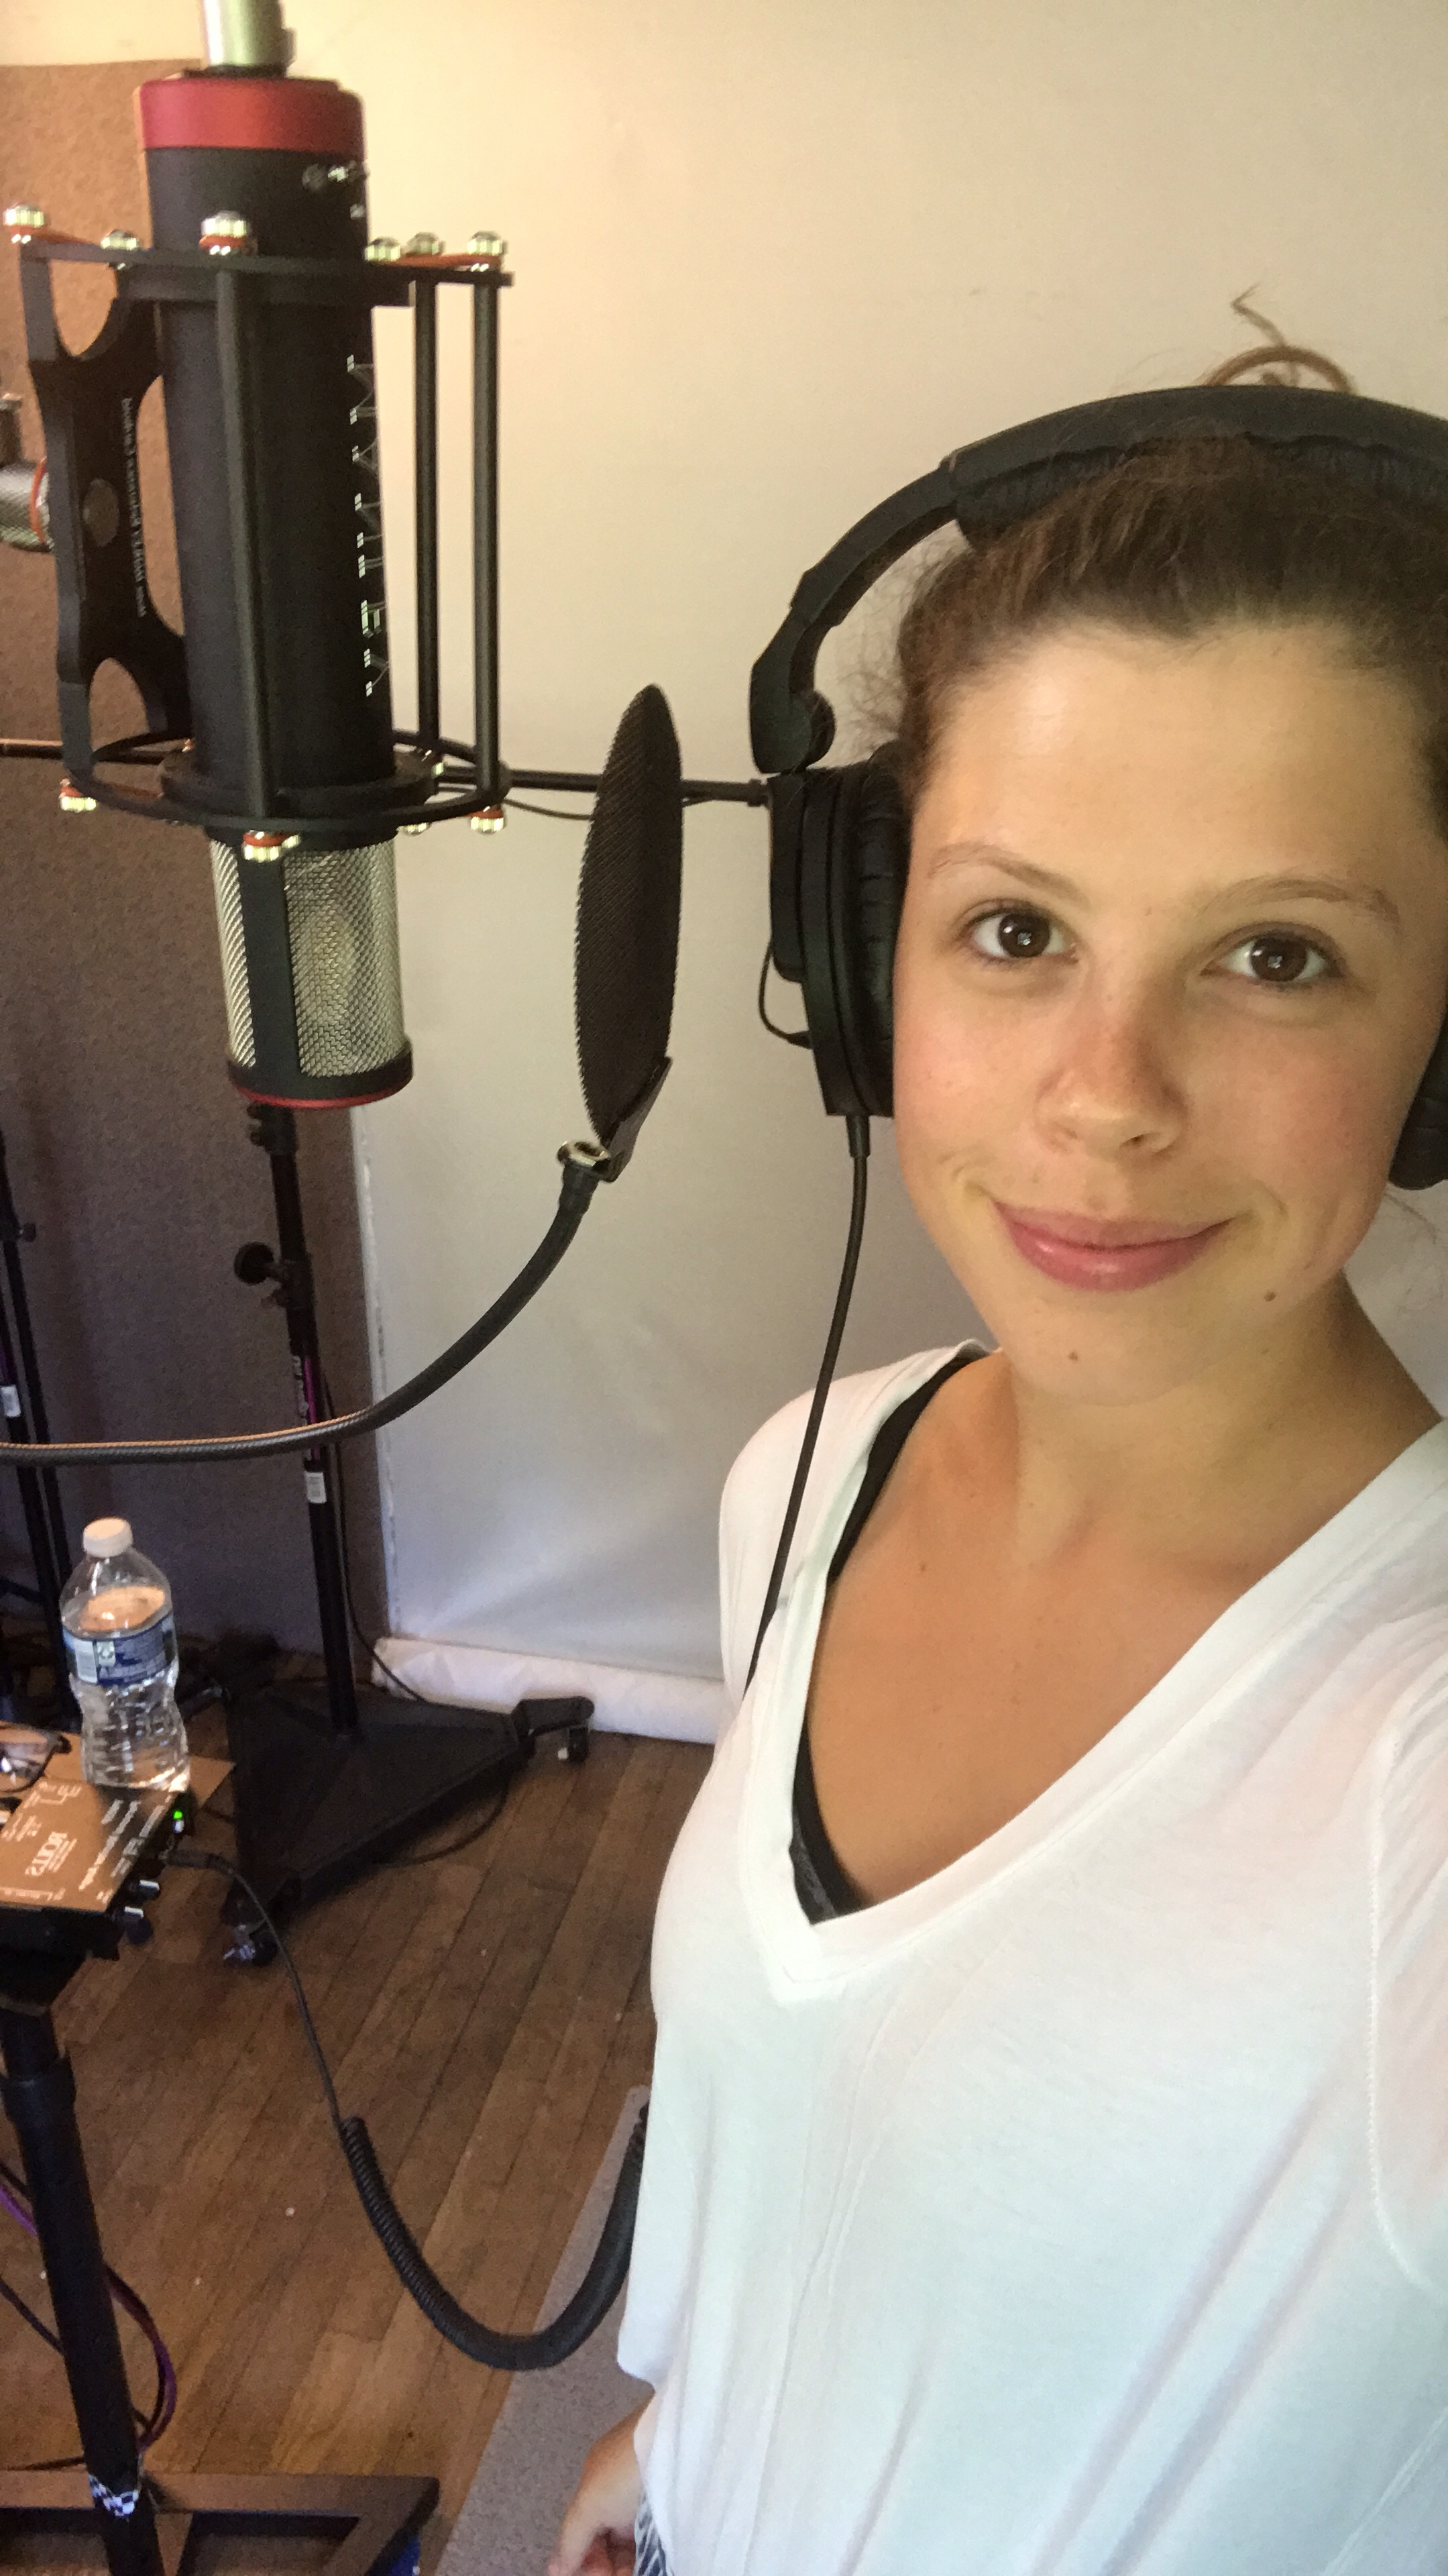 Demoing at Kim's Studio!